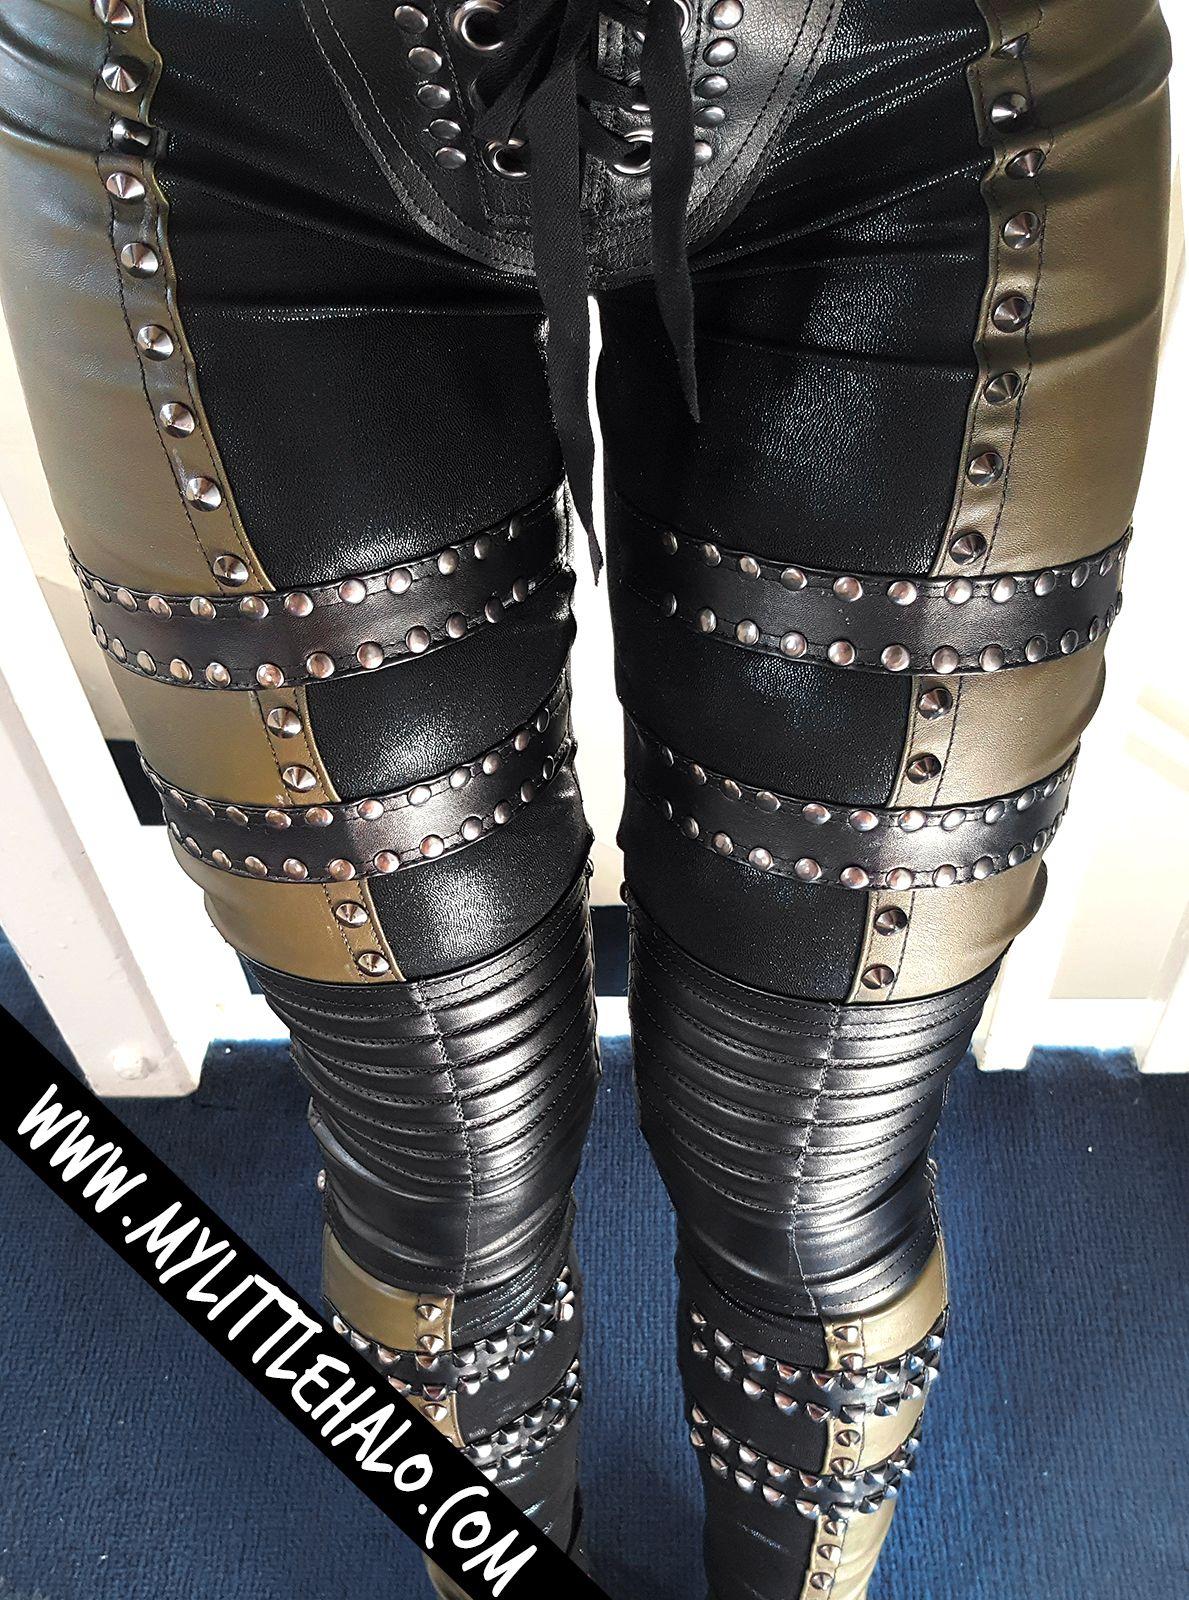 b375bdd02894f Fitstar Ironweave Shorts in 2019 | Wish List | Sports leggings, Leggings  are not pants, Running pants